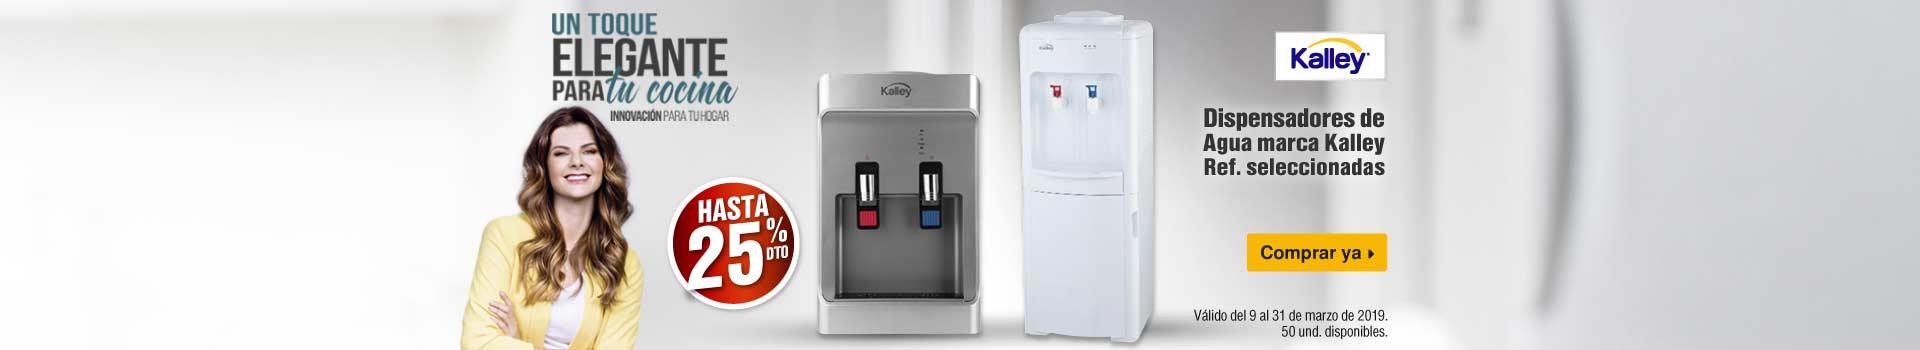 AK-KT-mayores-3-ELECT-BCAT-refrigeracion-kalley-090319